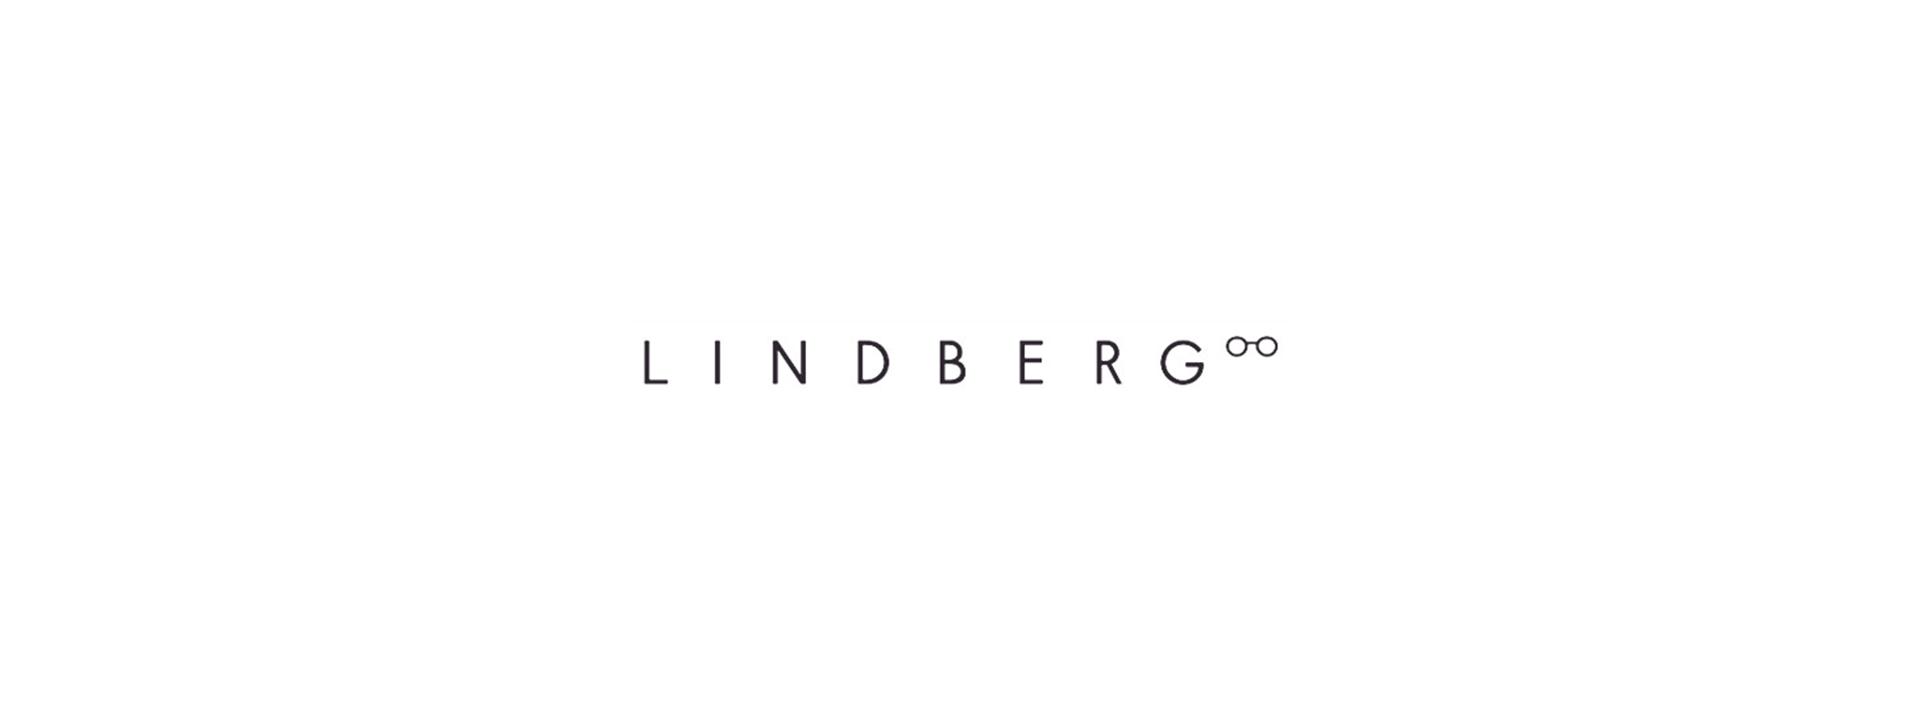 Lindberg.png